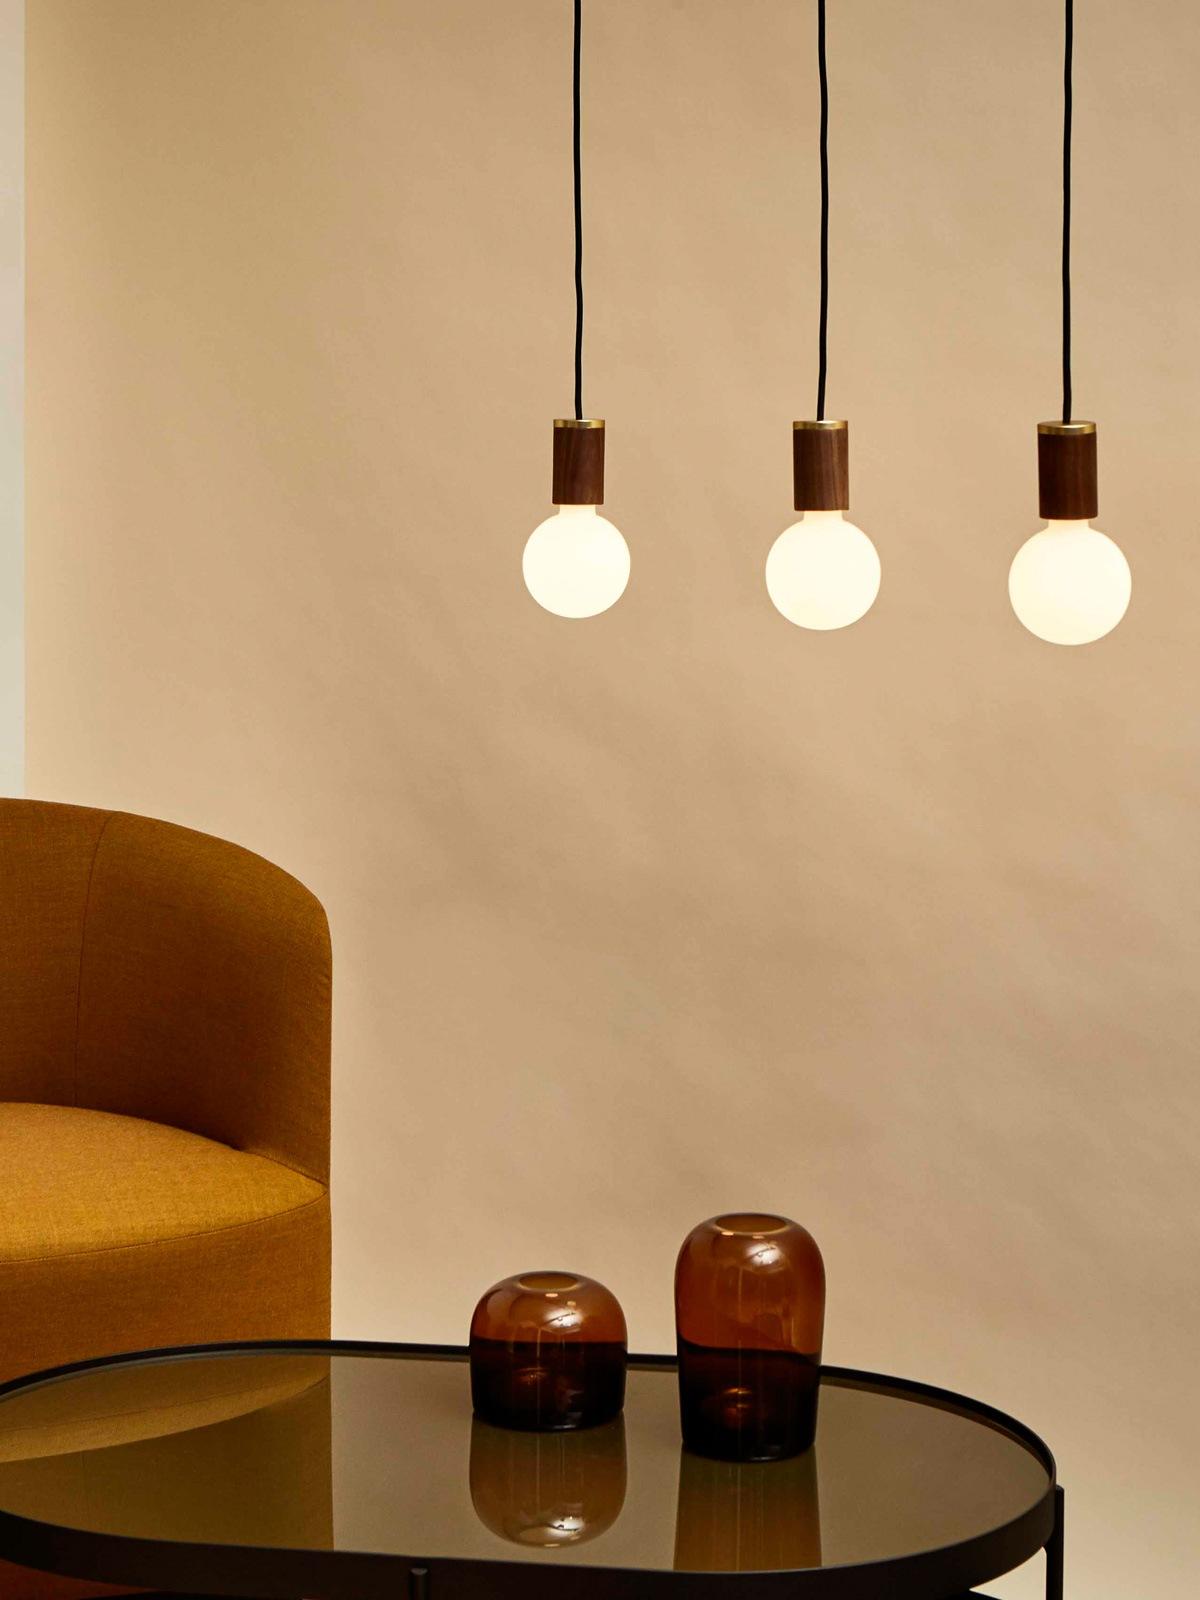 Tala Lampenhalter mit mundgeblasenem Leuchtmittel DesignOrt Lampen Berlin